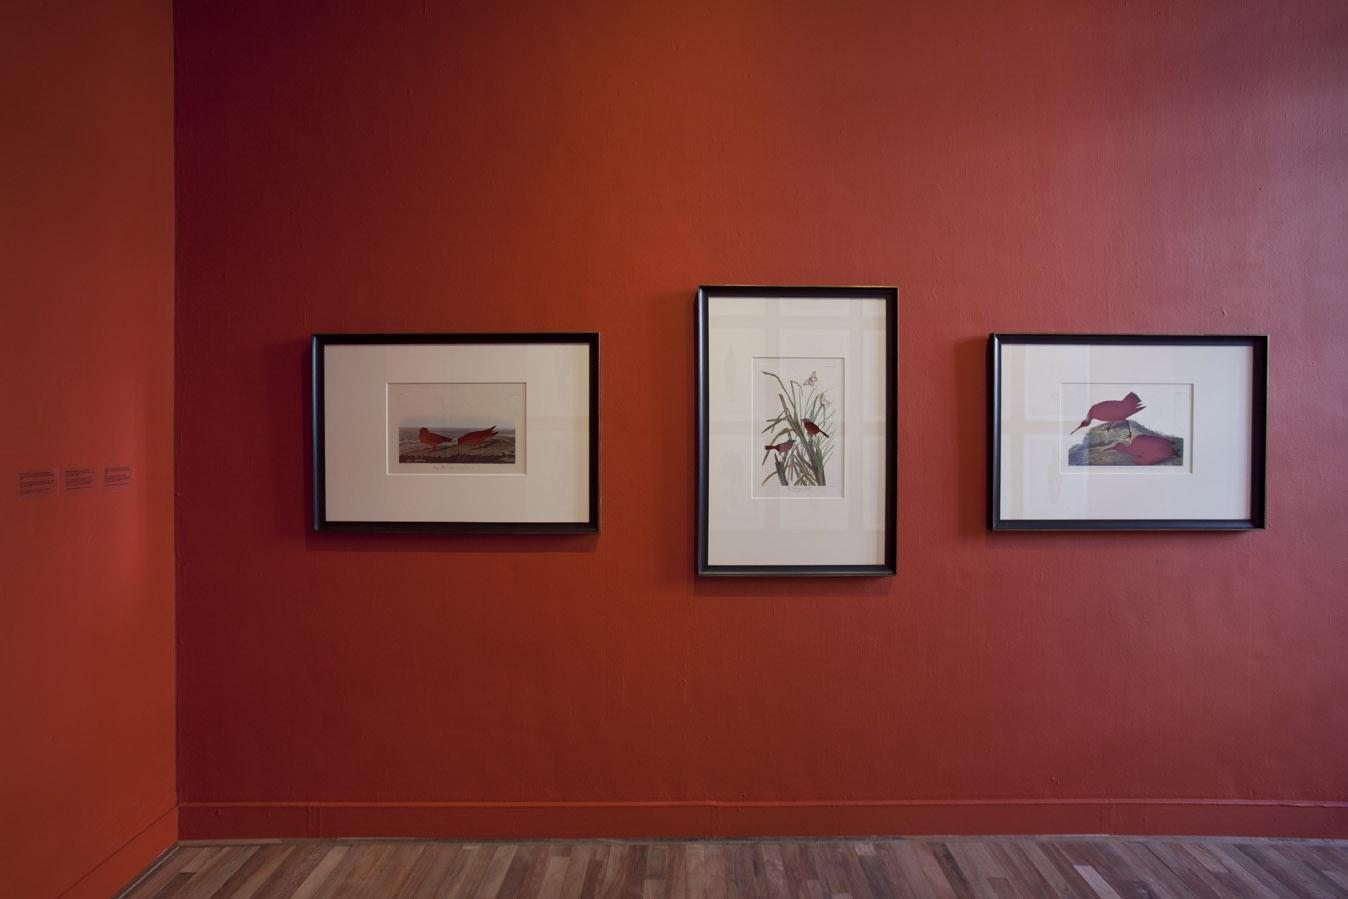 Frameworks of Absence, Brandon Ballengée, Museum Het Domein, 2014.